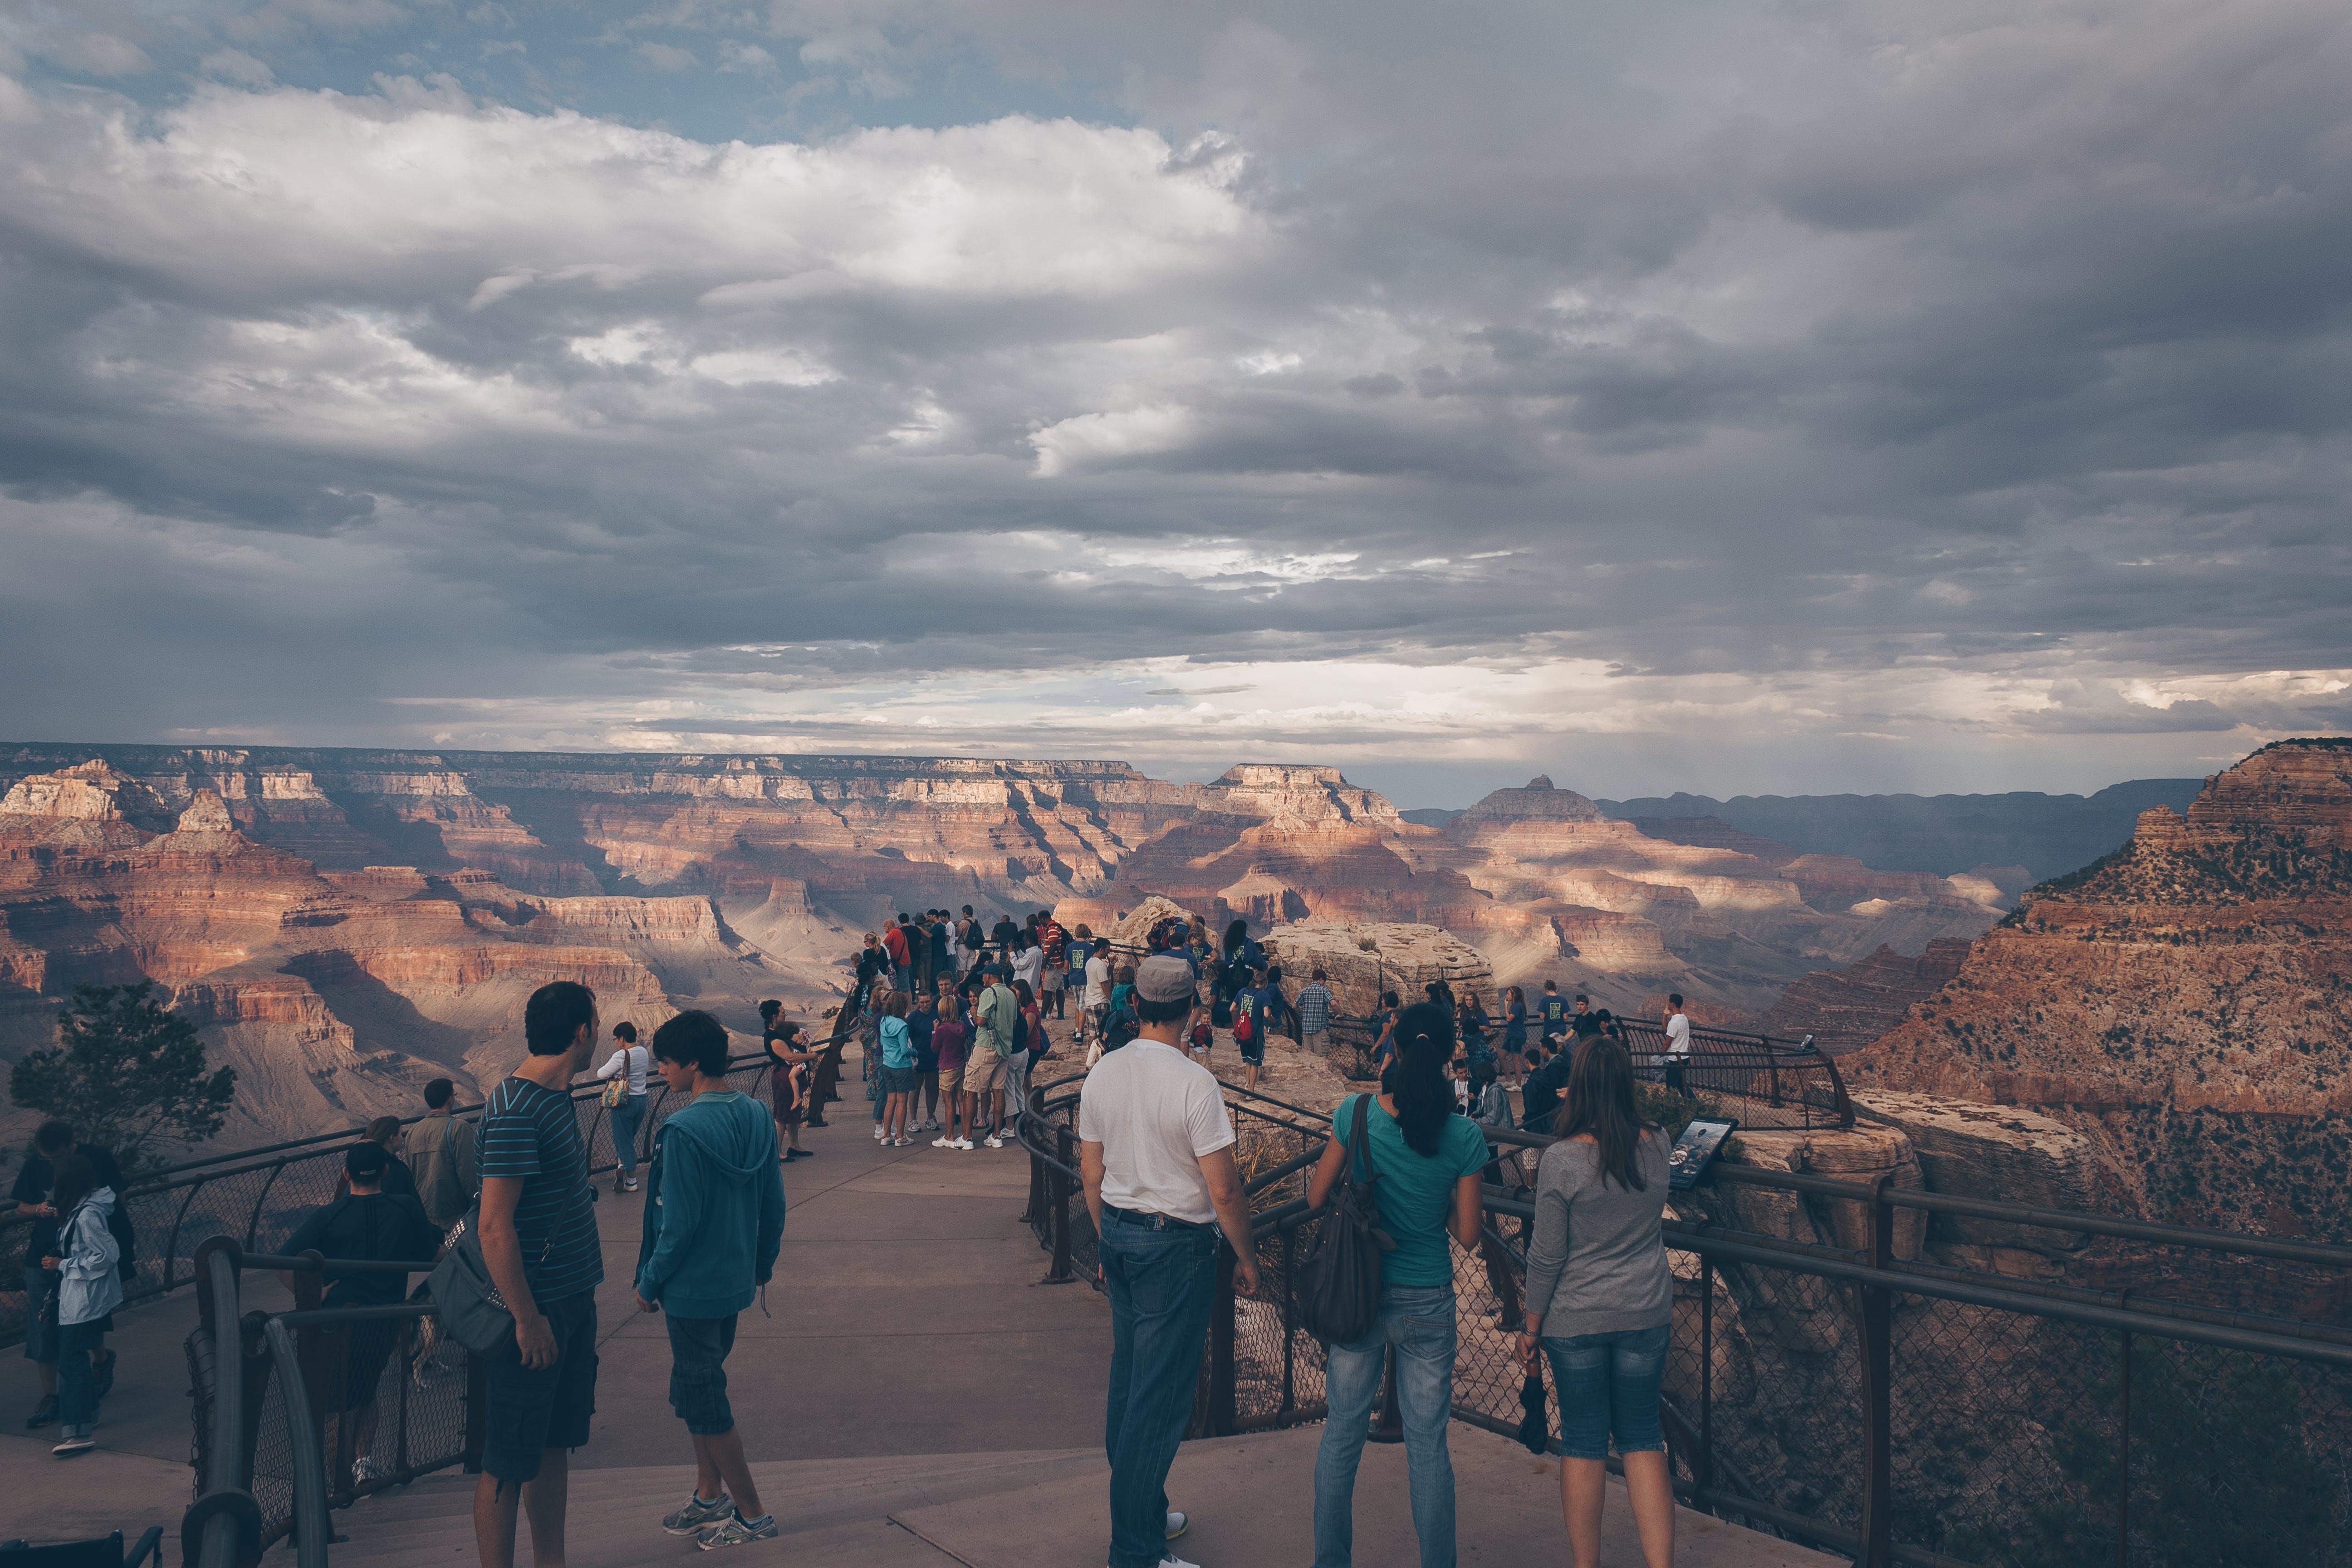 Kostenloses Stock Foto zu abenteuer, berg, canyon, erholung